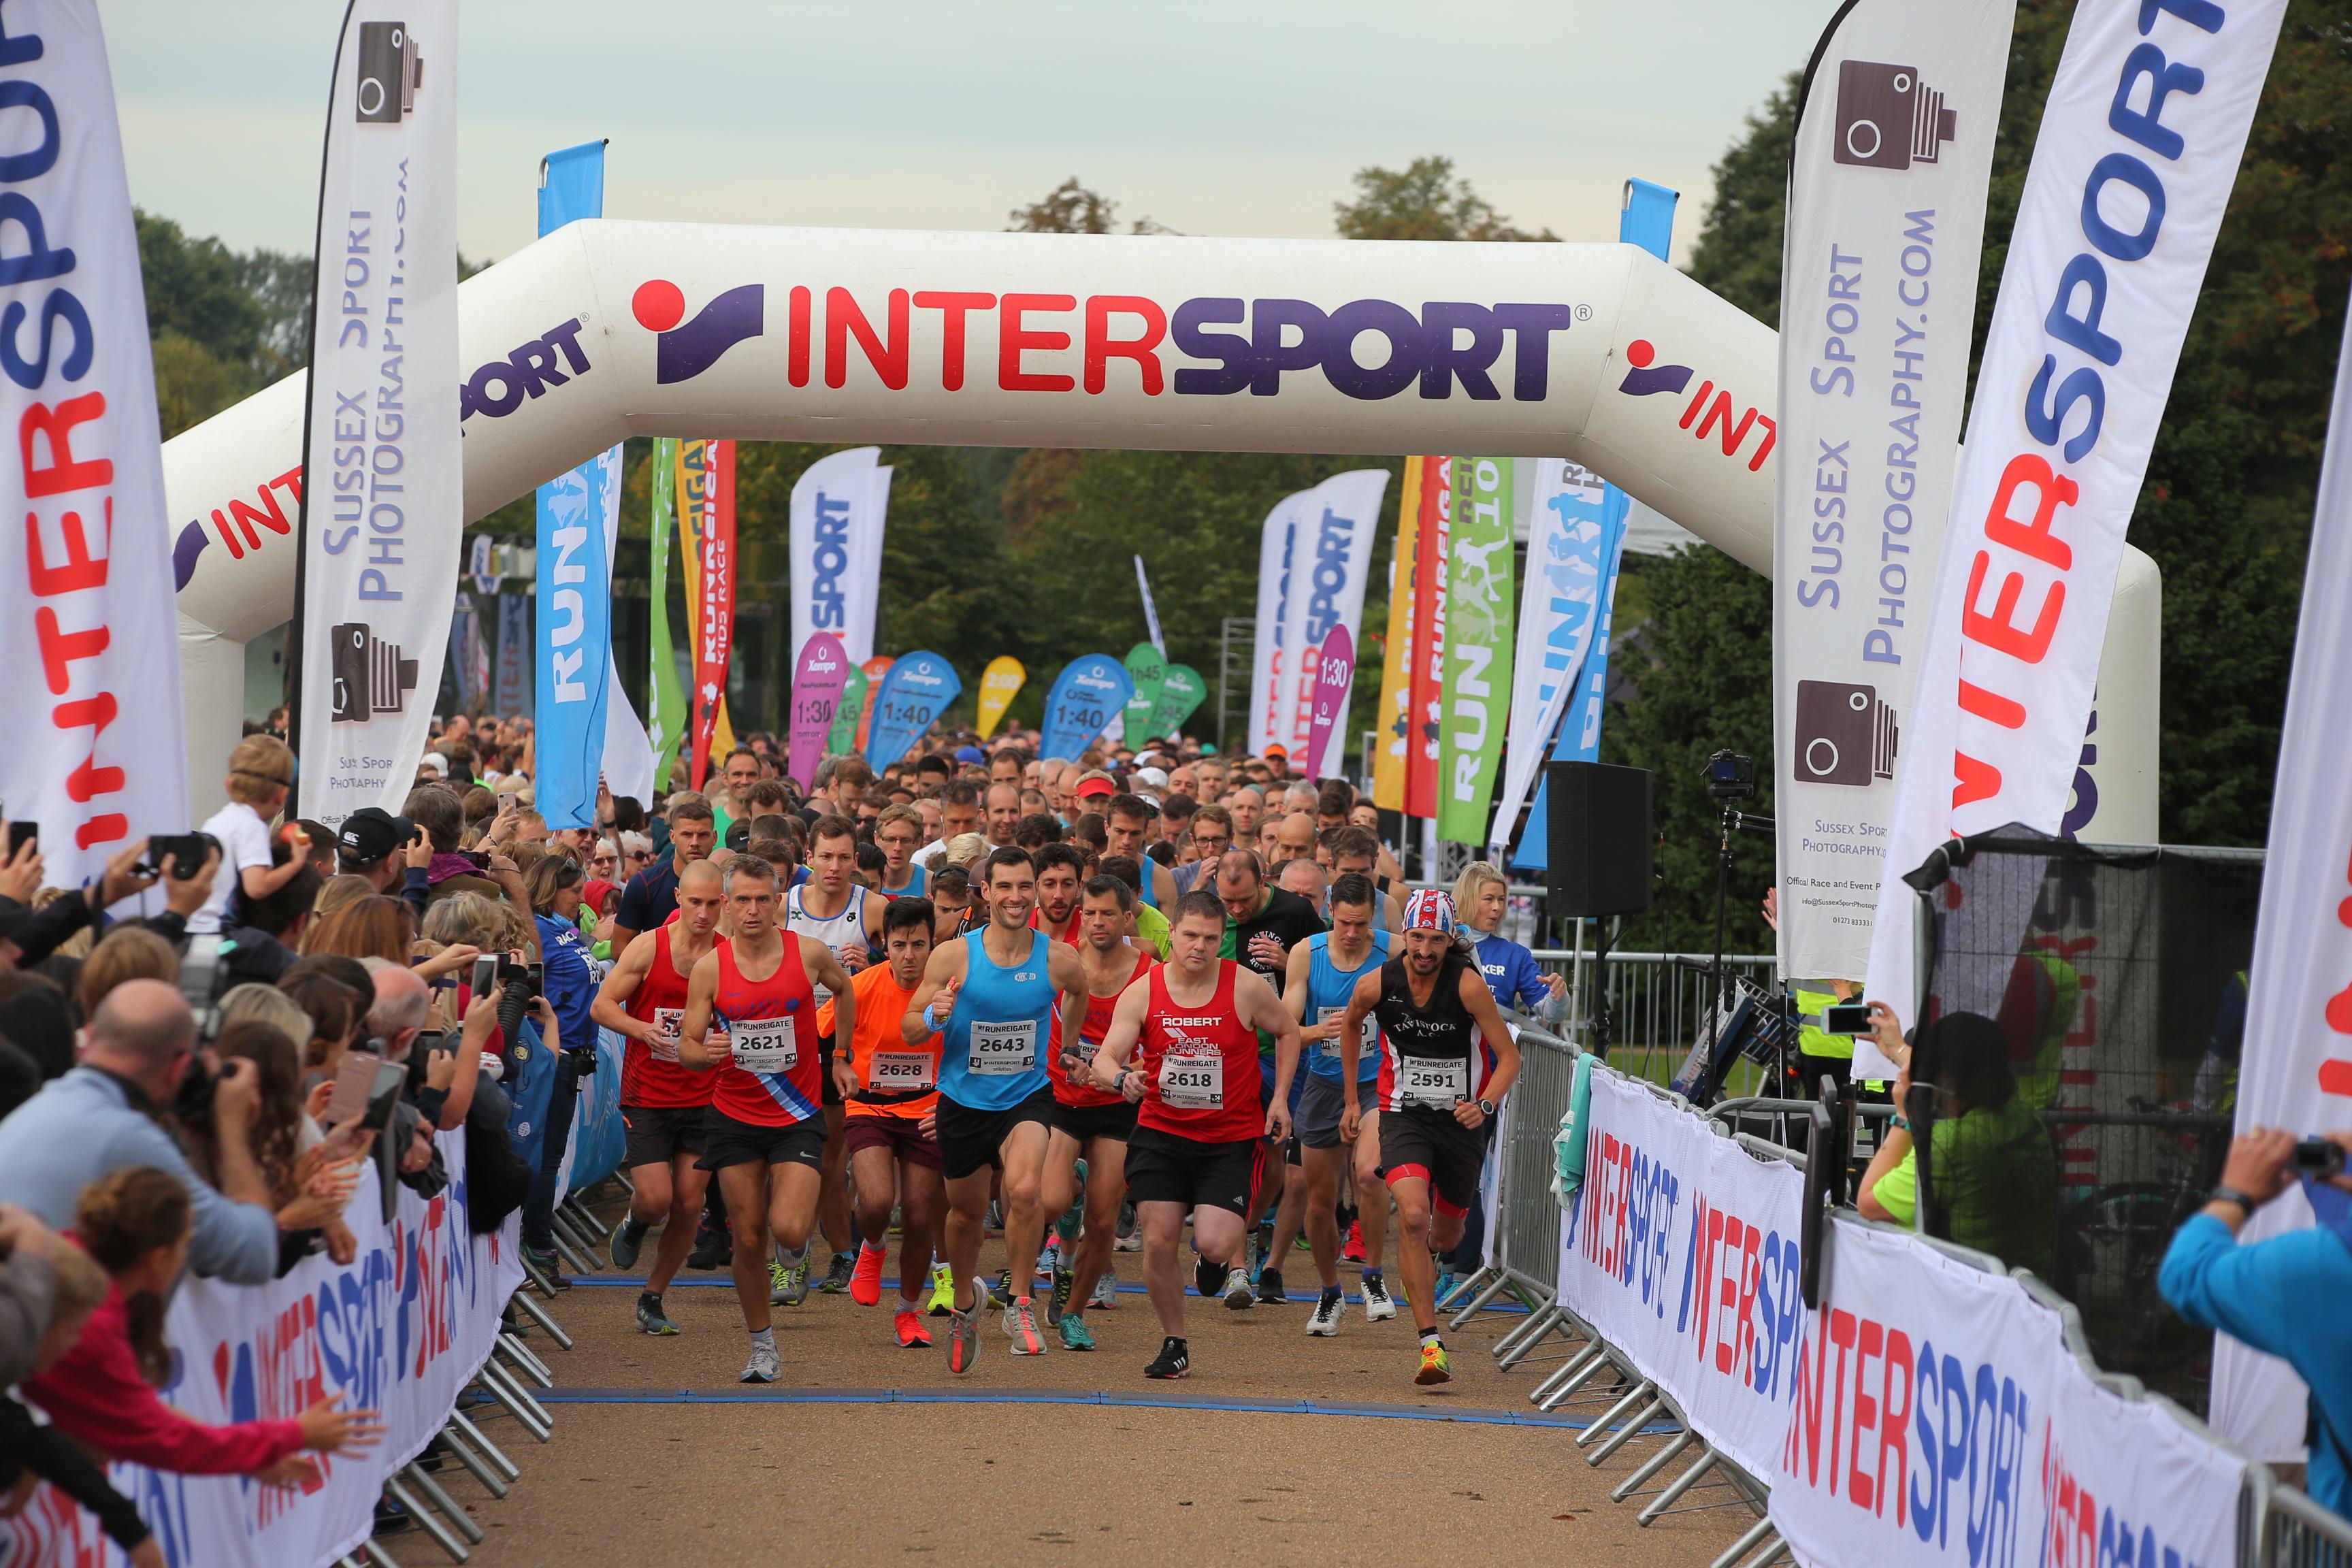 Intersport Run Reigate Half\u002DMarathon, 10K, 5K - cover image